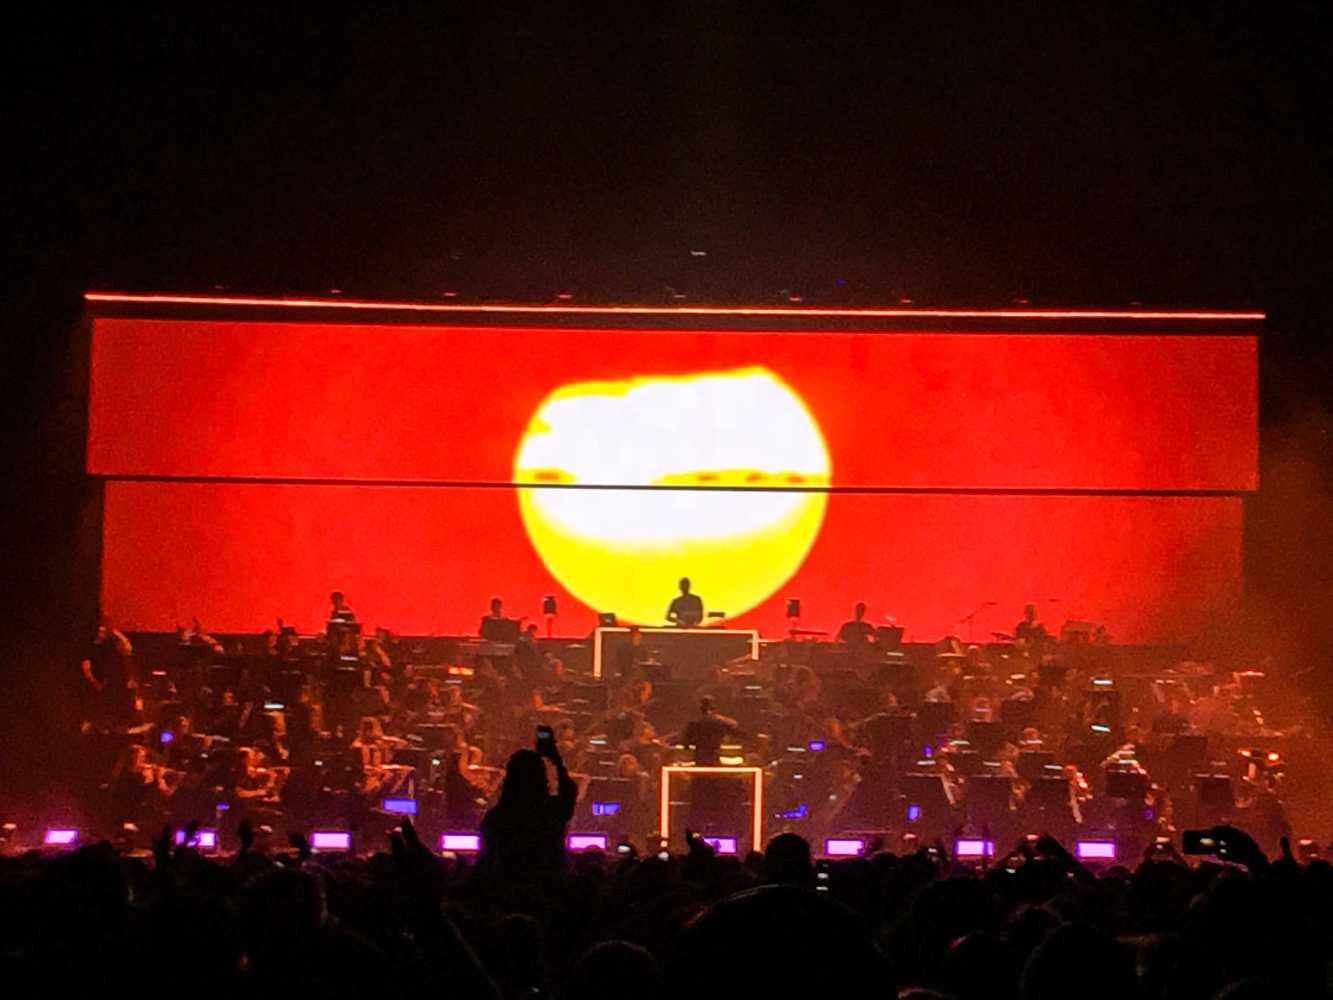 Ibiza classics thrives in uk arenas for Ibiza classics heritage orchestra